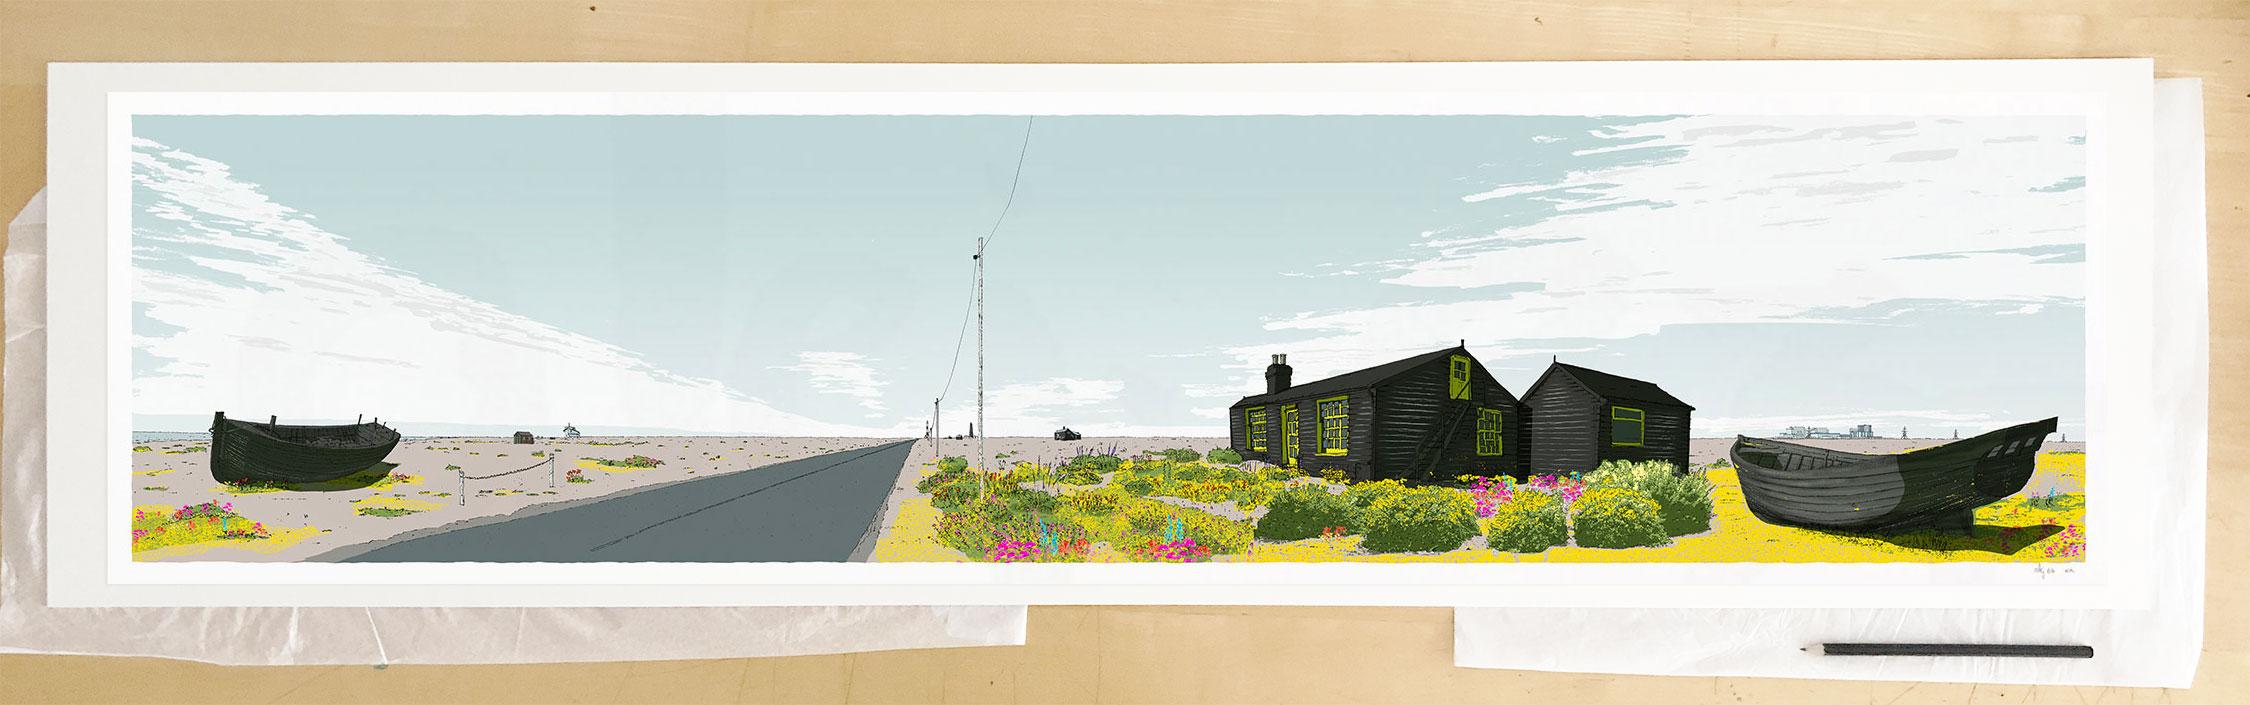 Fine art print by UK artist alej ez titled Stratus Over Dungeness Derek Jarman Prospect CottageStratus Over Dungeness Derek Jarman Prospect Cottage